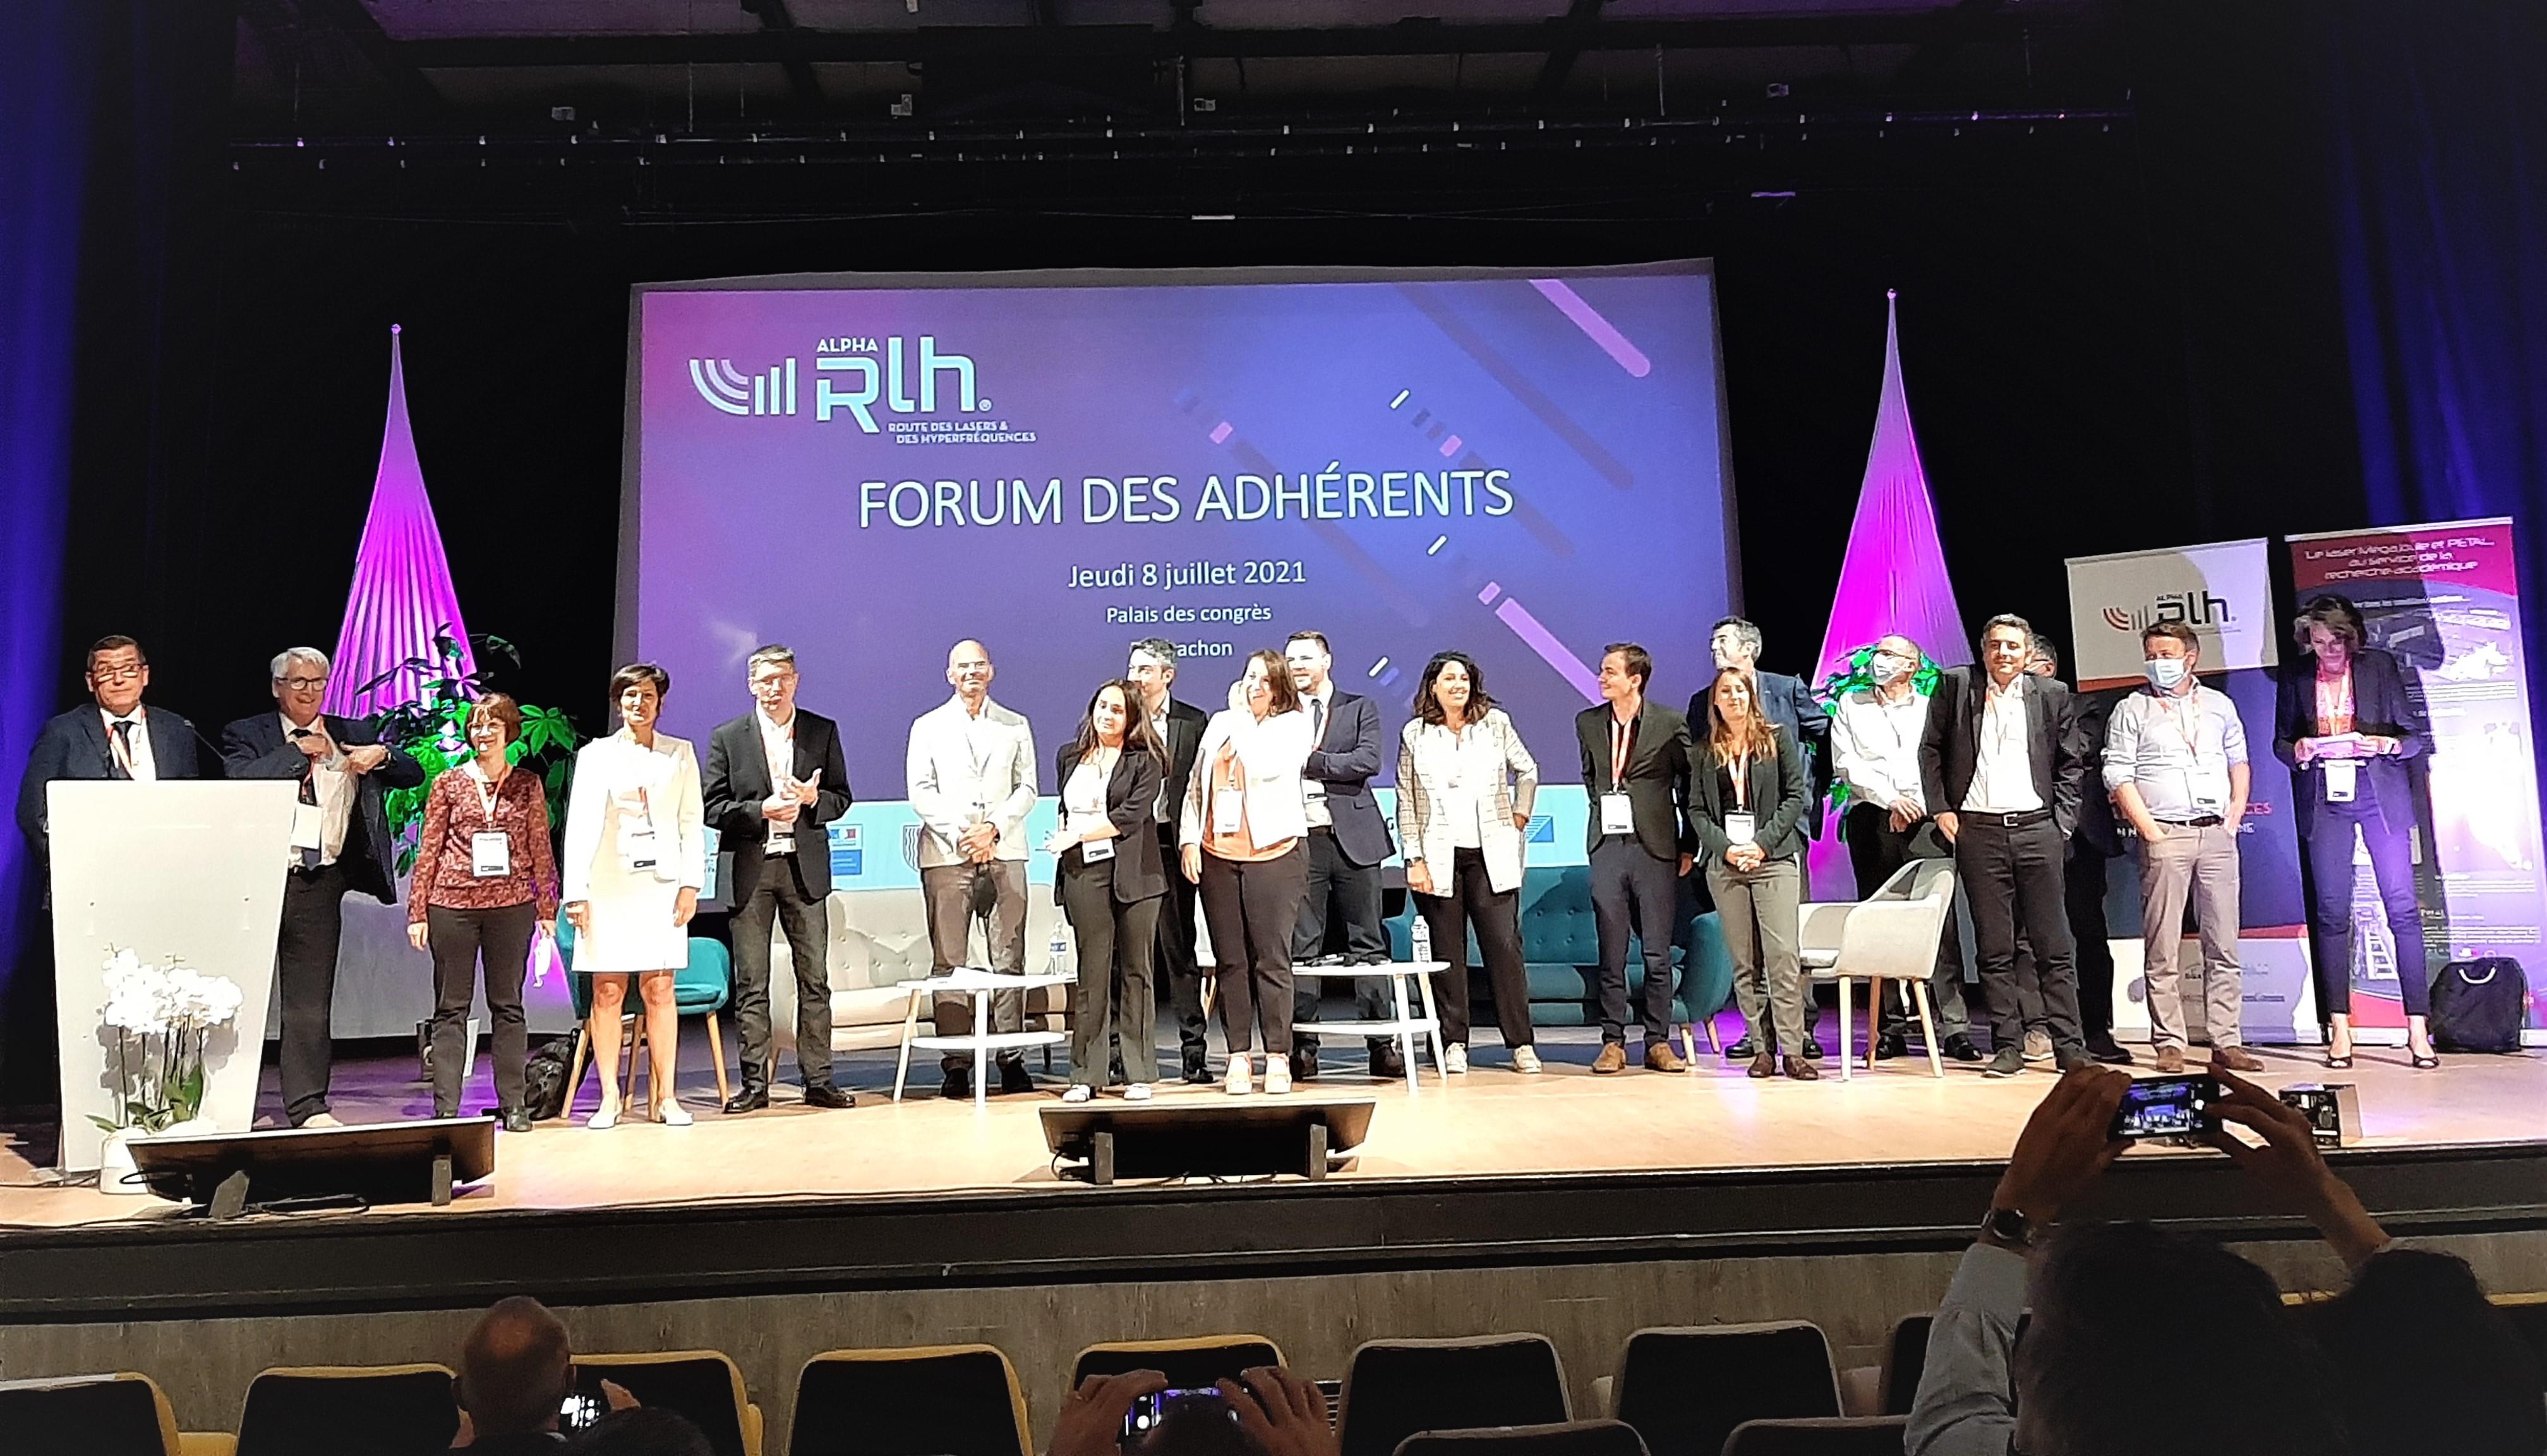 Forum des adhérents ALPHA-RLH 2021